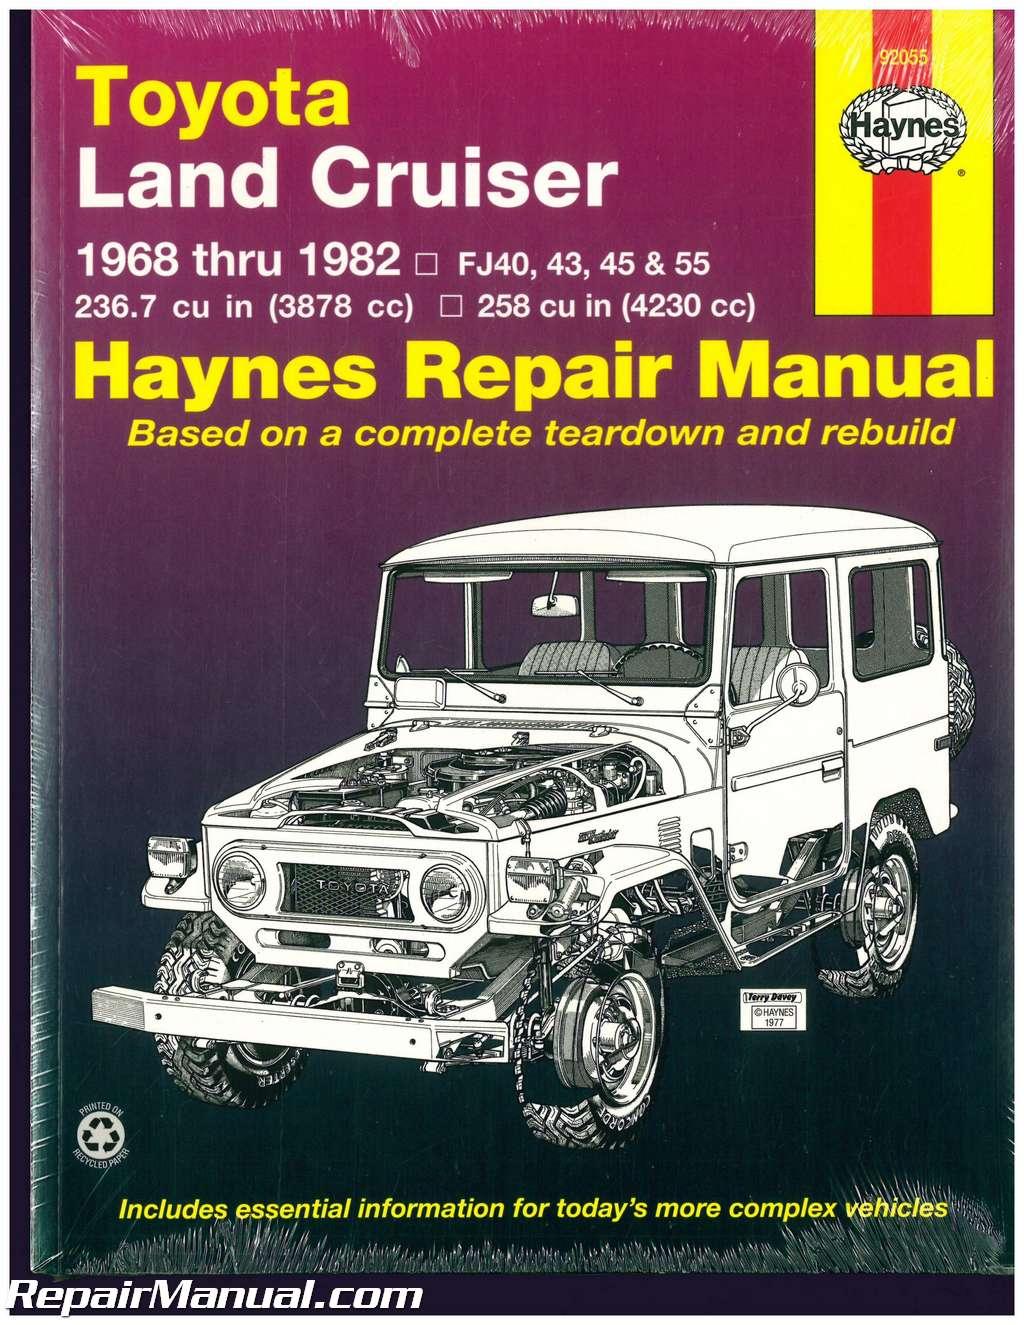 automotive repair manuals haynes repair manuals bookcracked